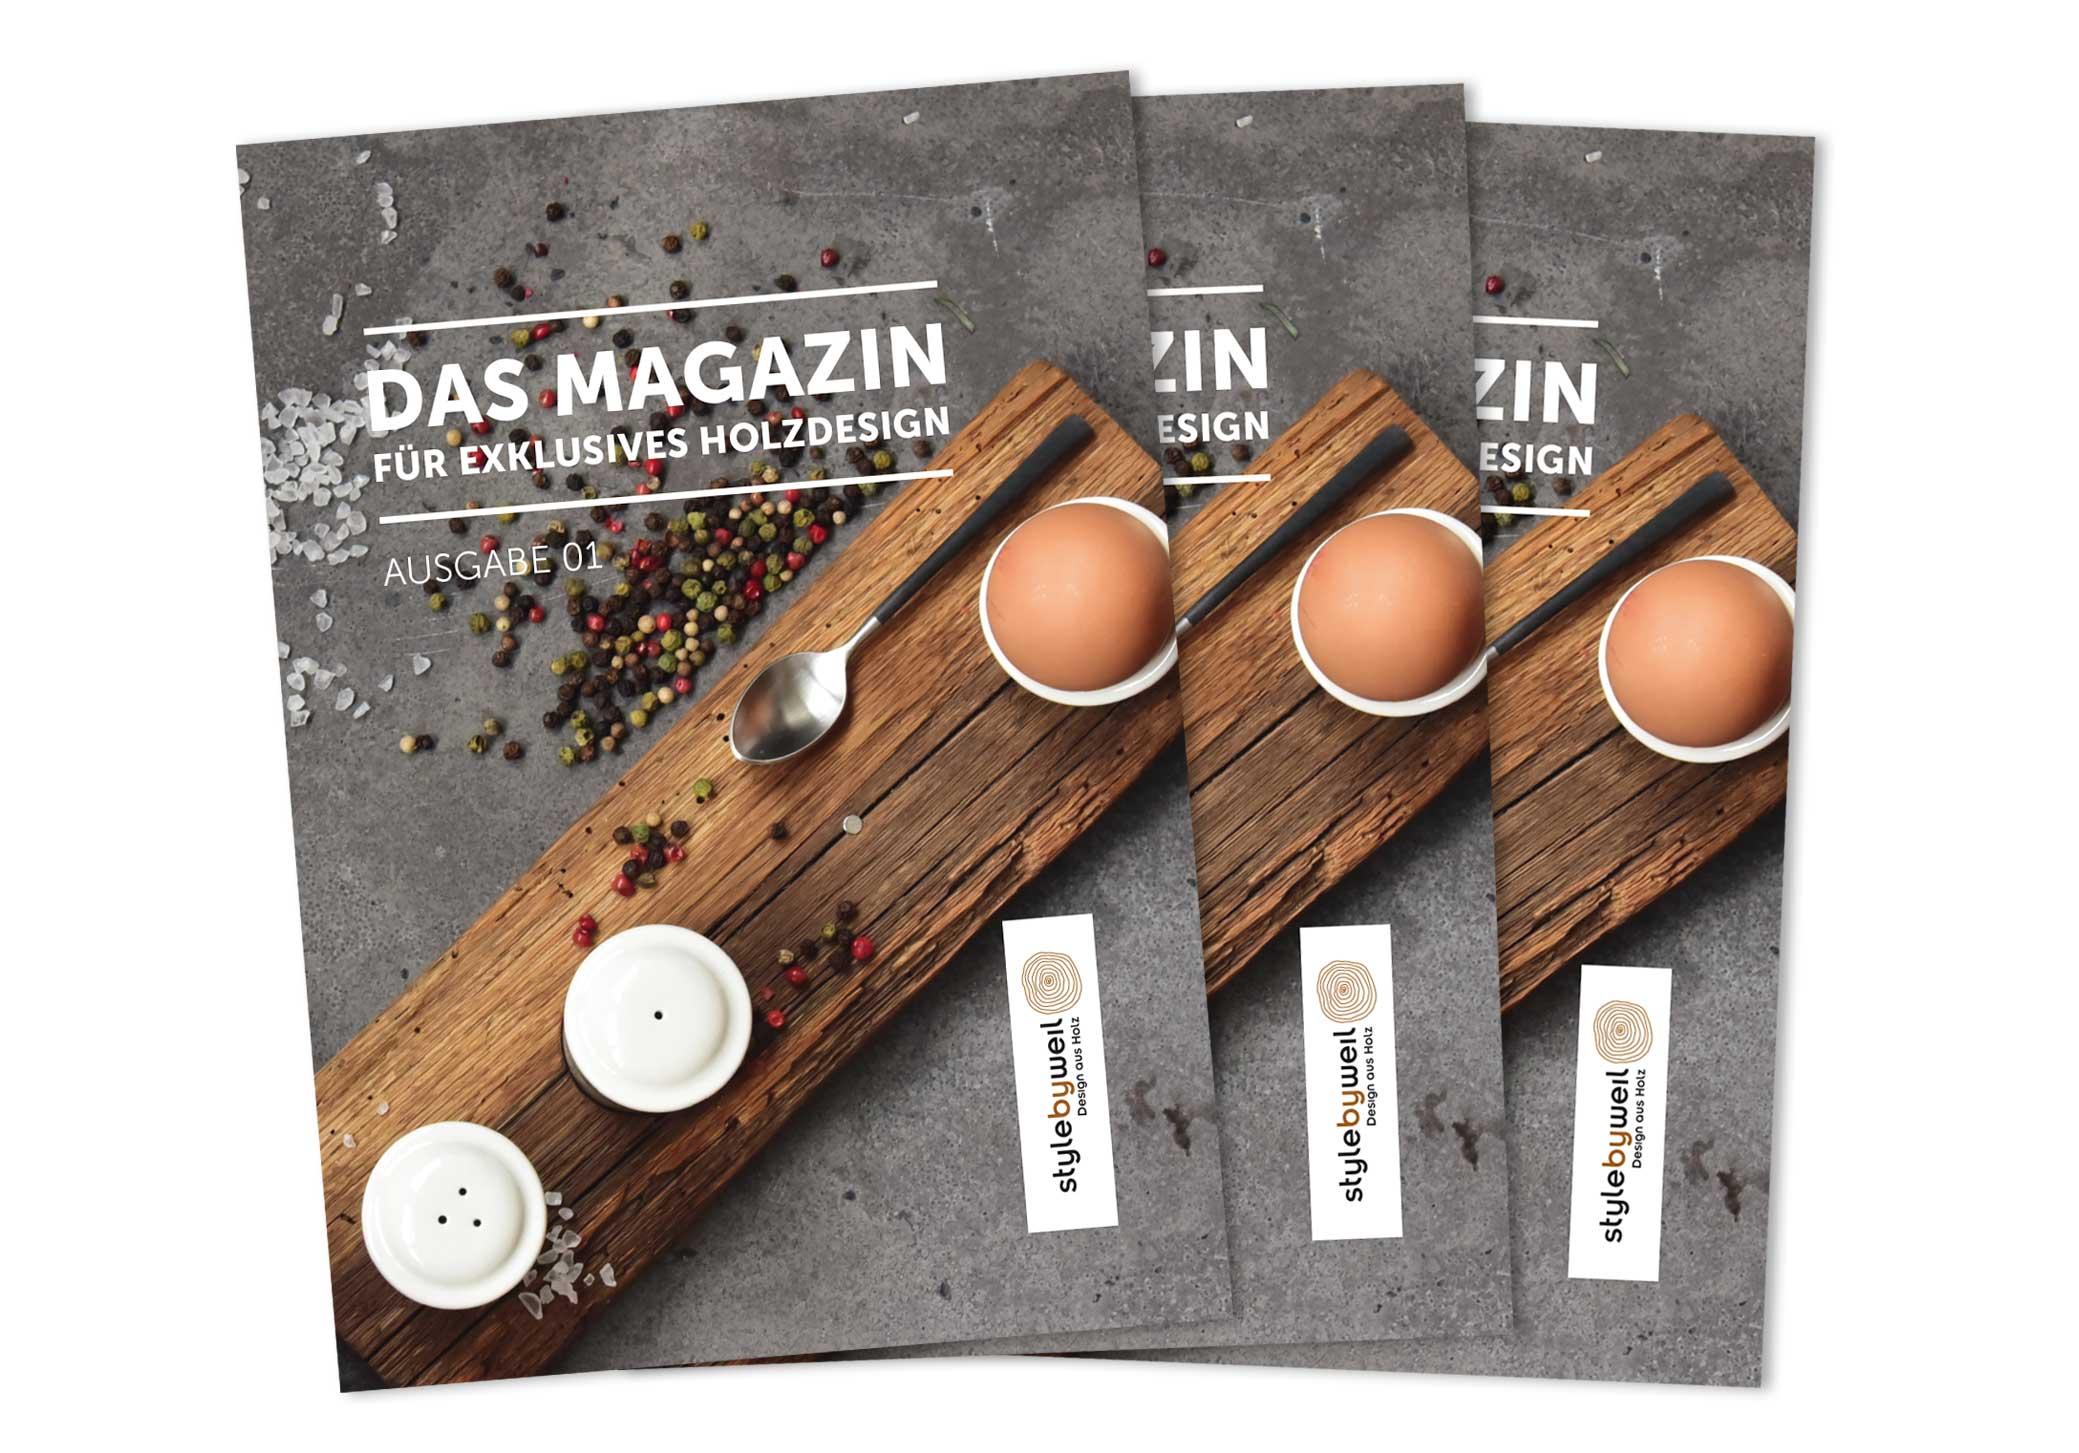 arangement 3 Magazin Cover